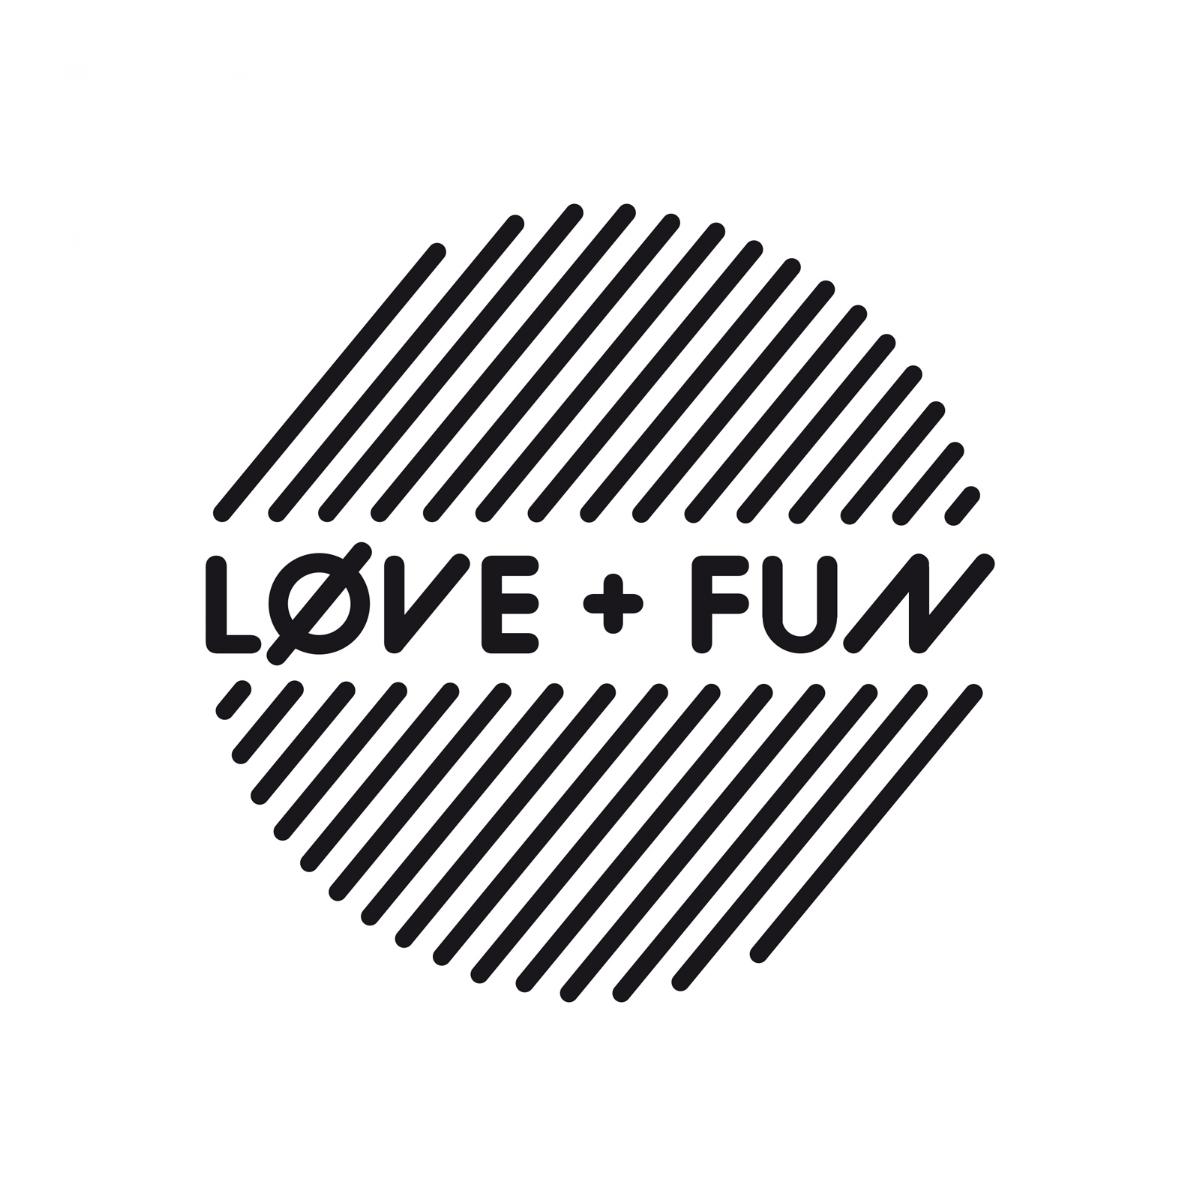 Manifesto-Market-love-fun-socks-2.jpg